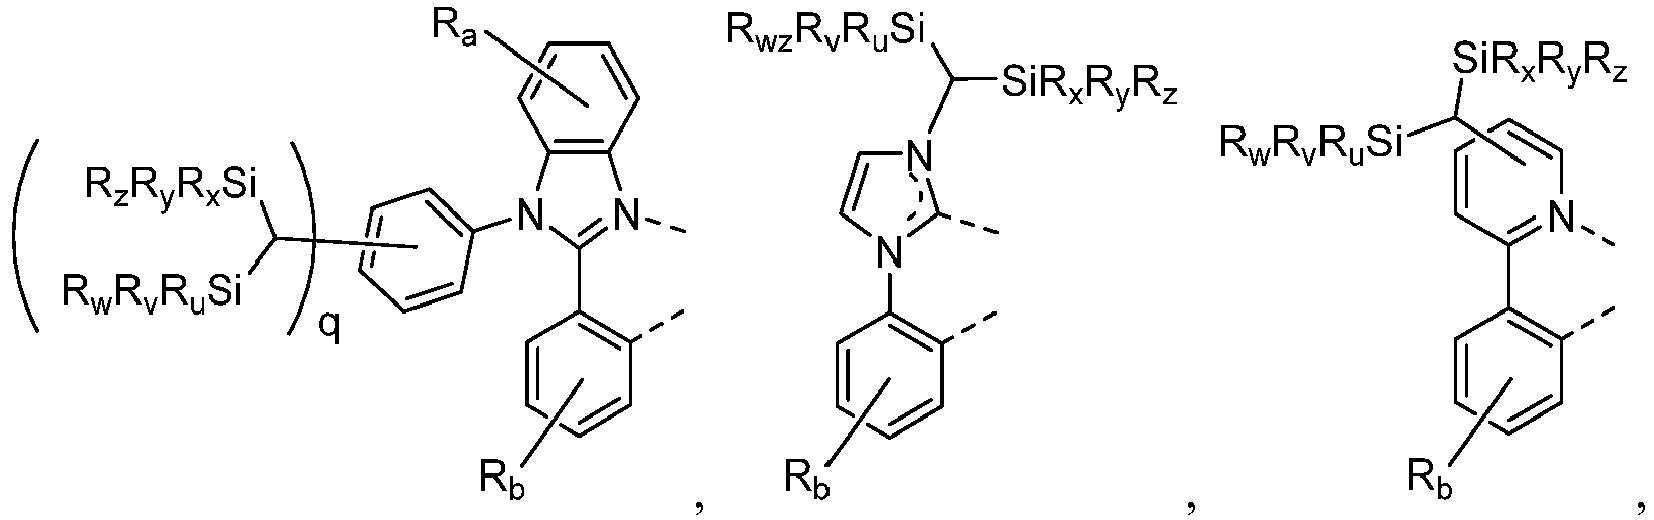 Figure imgb0318